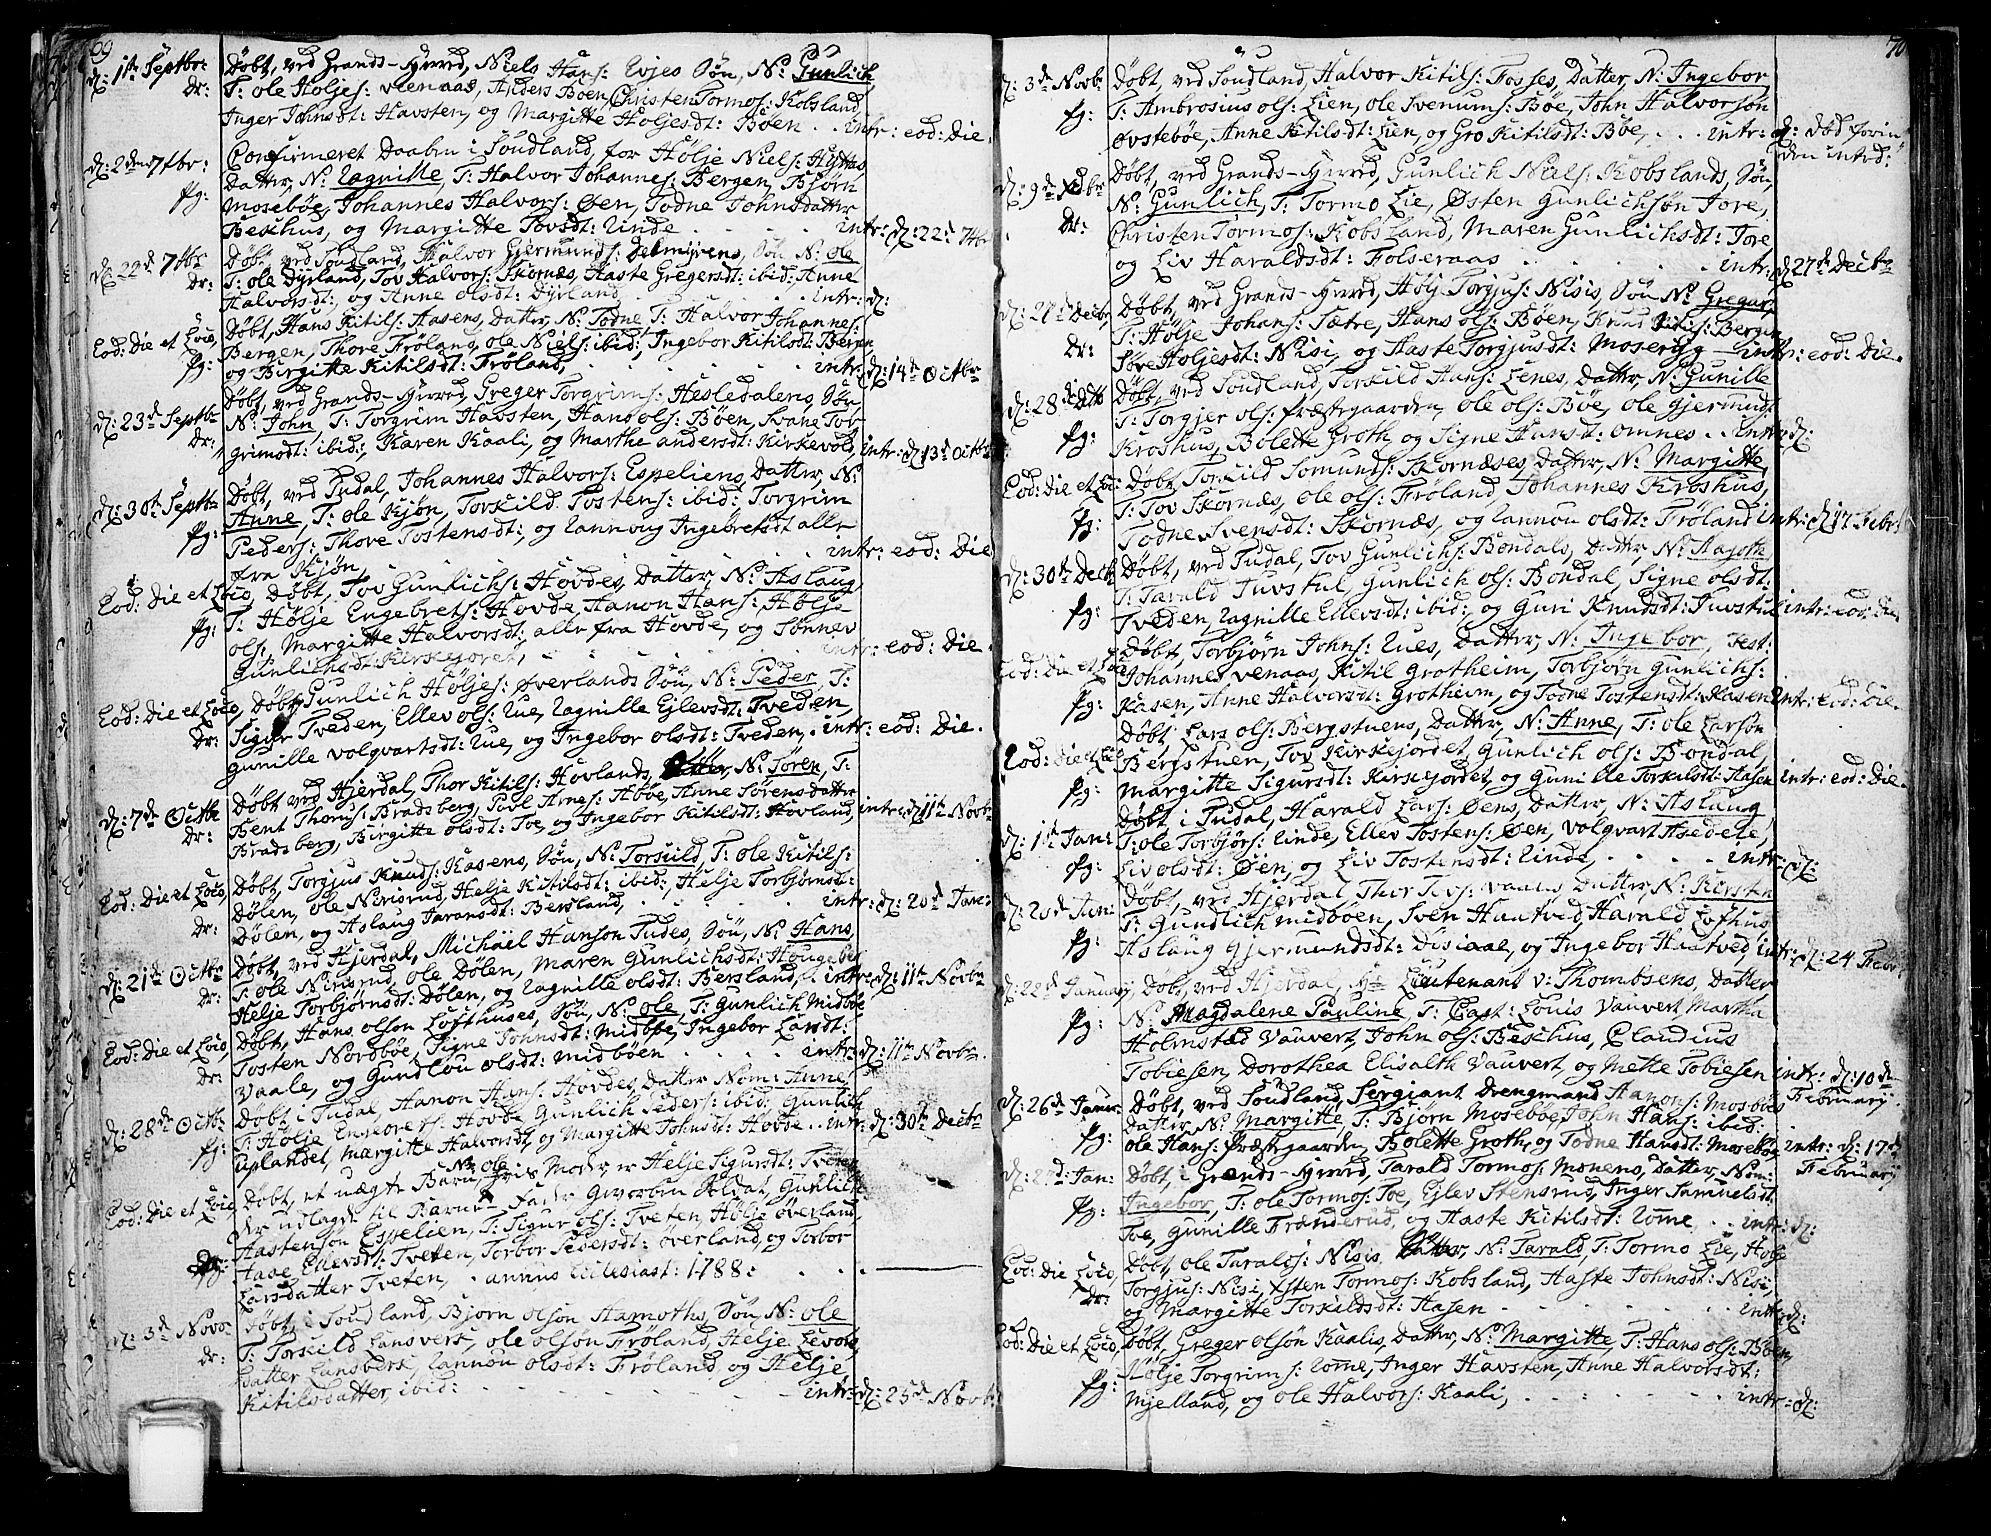 SAKO, Hjartdal kirkebøker, F/Fa/L0005: Ministerialbok nr. I 5, 1776-1801, s. 69-70